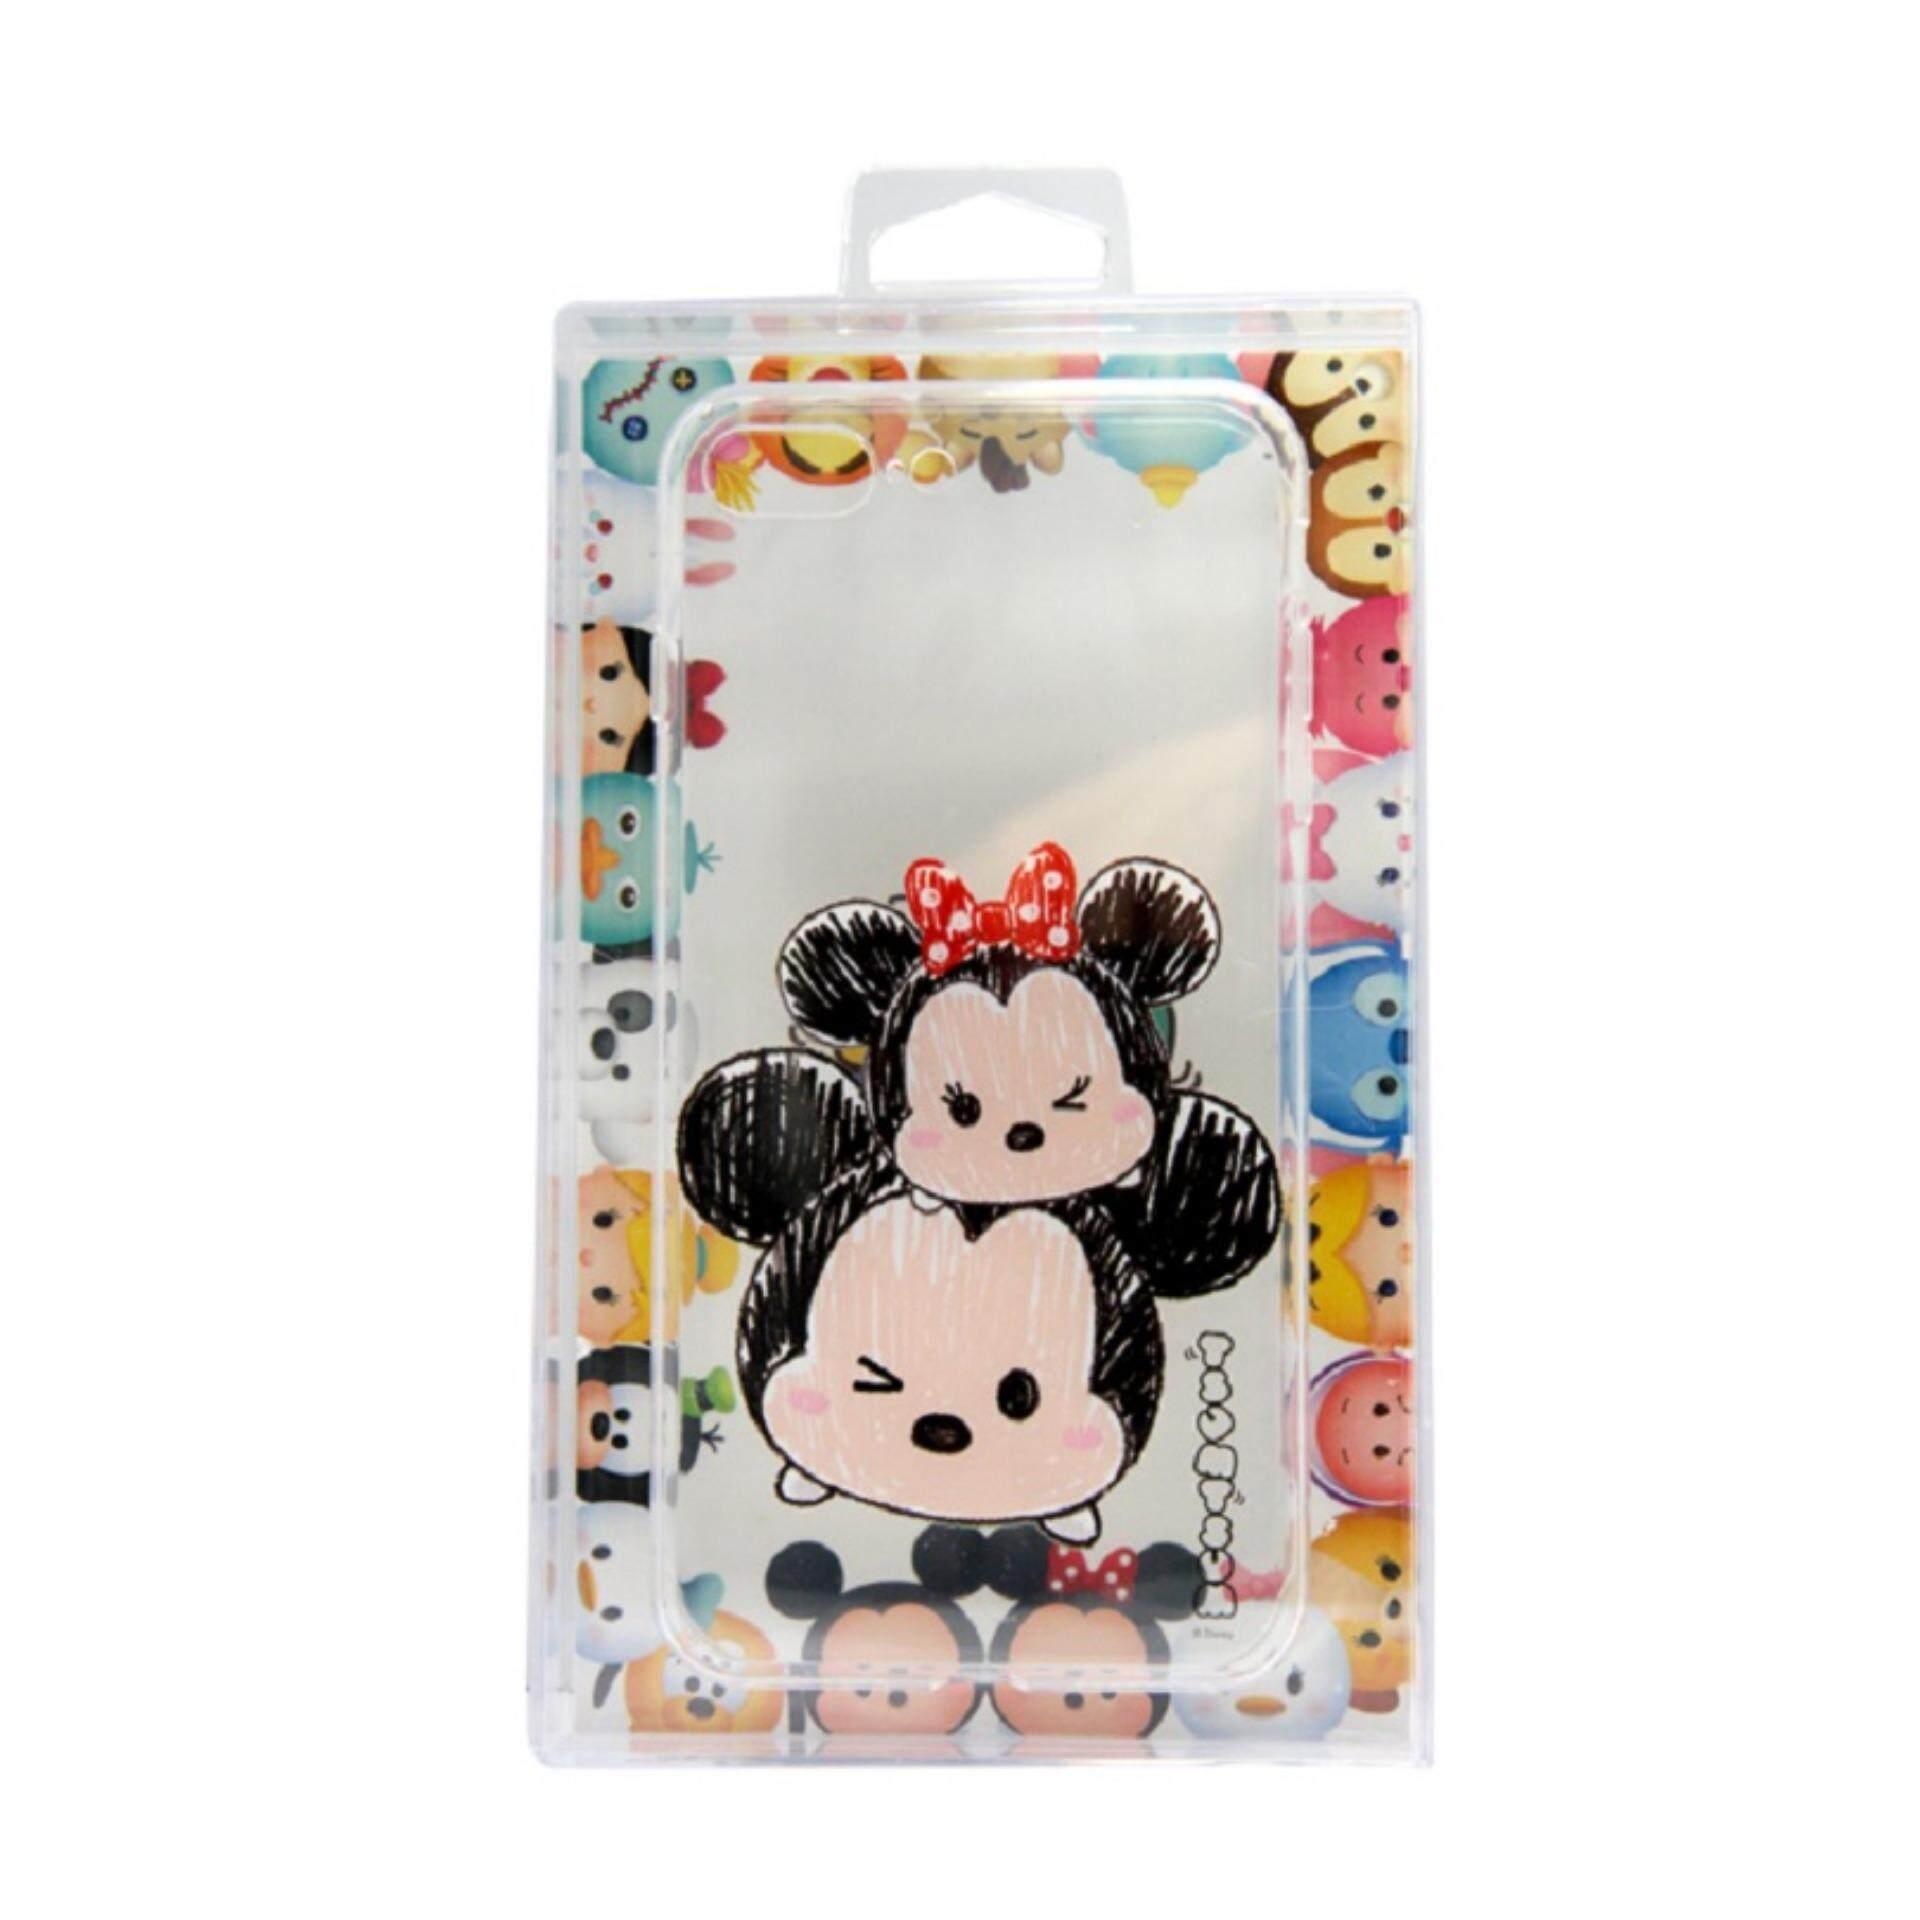 newest 4fb0e c44f2 Disney Tsum Tsum Transparent iPhone 7 Plus Case - Mickey & Minnie